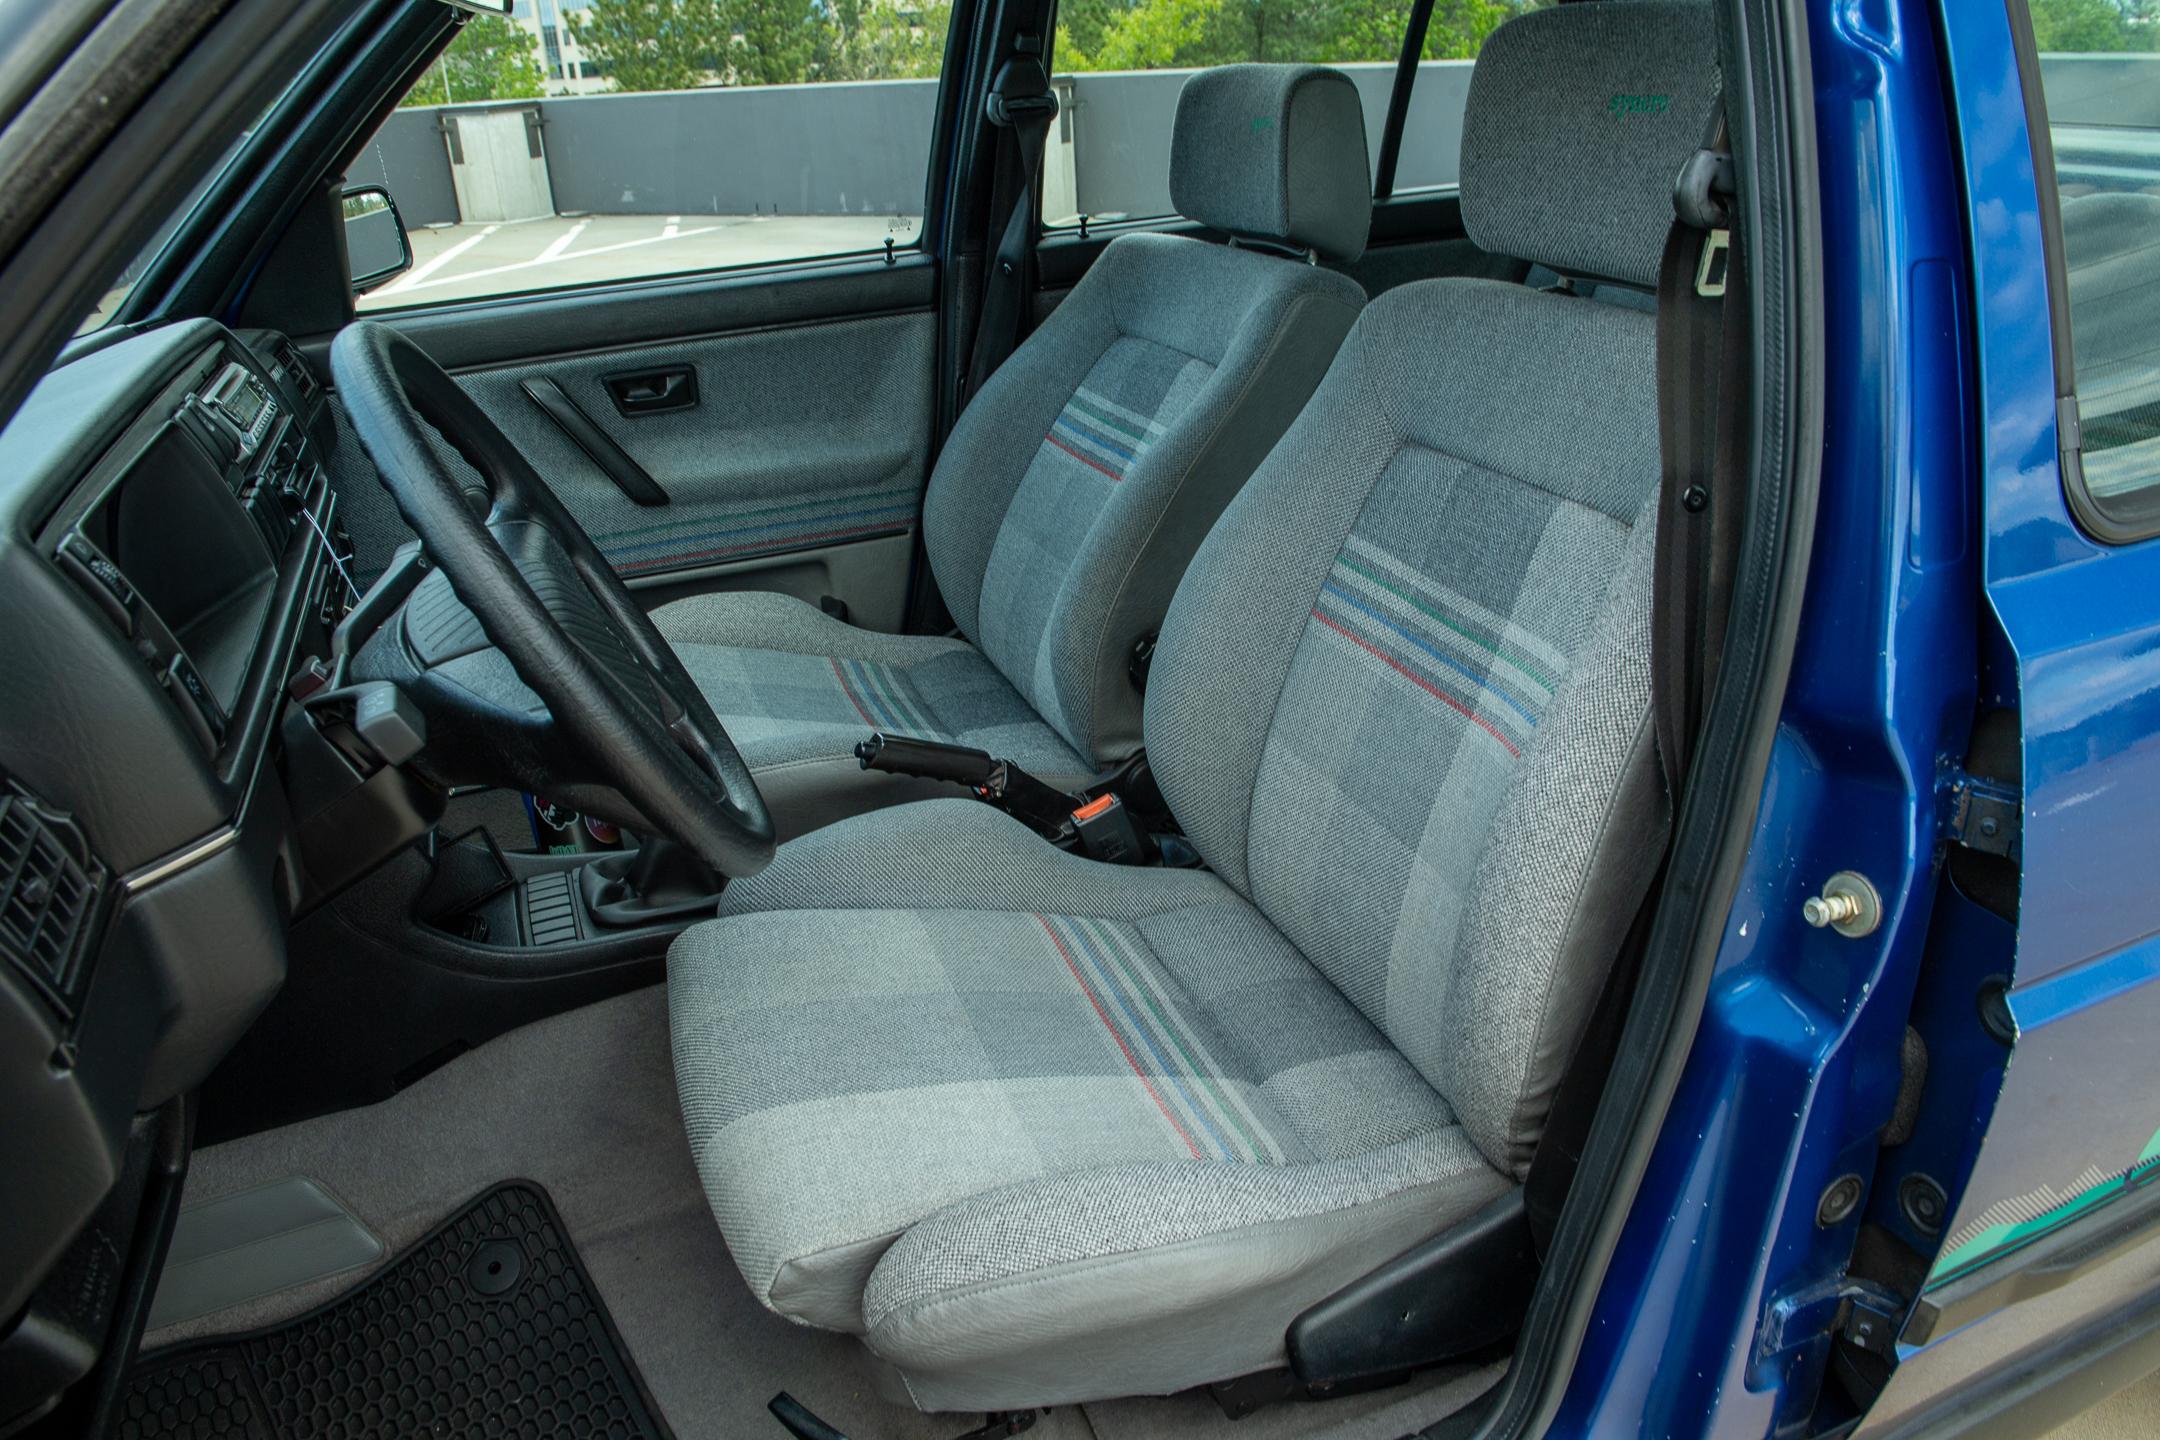 Volkswagen Golf Country interior seats